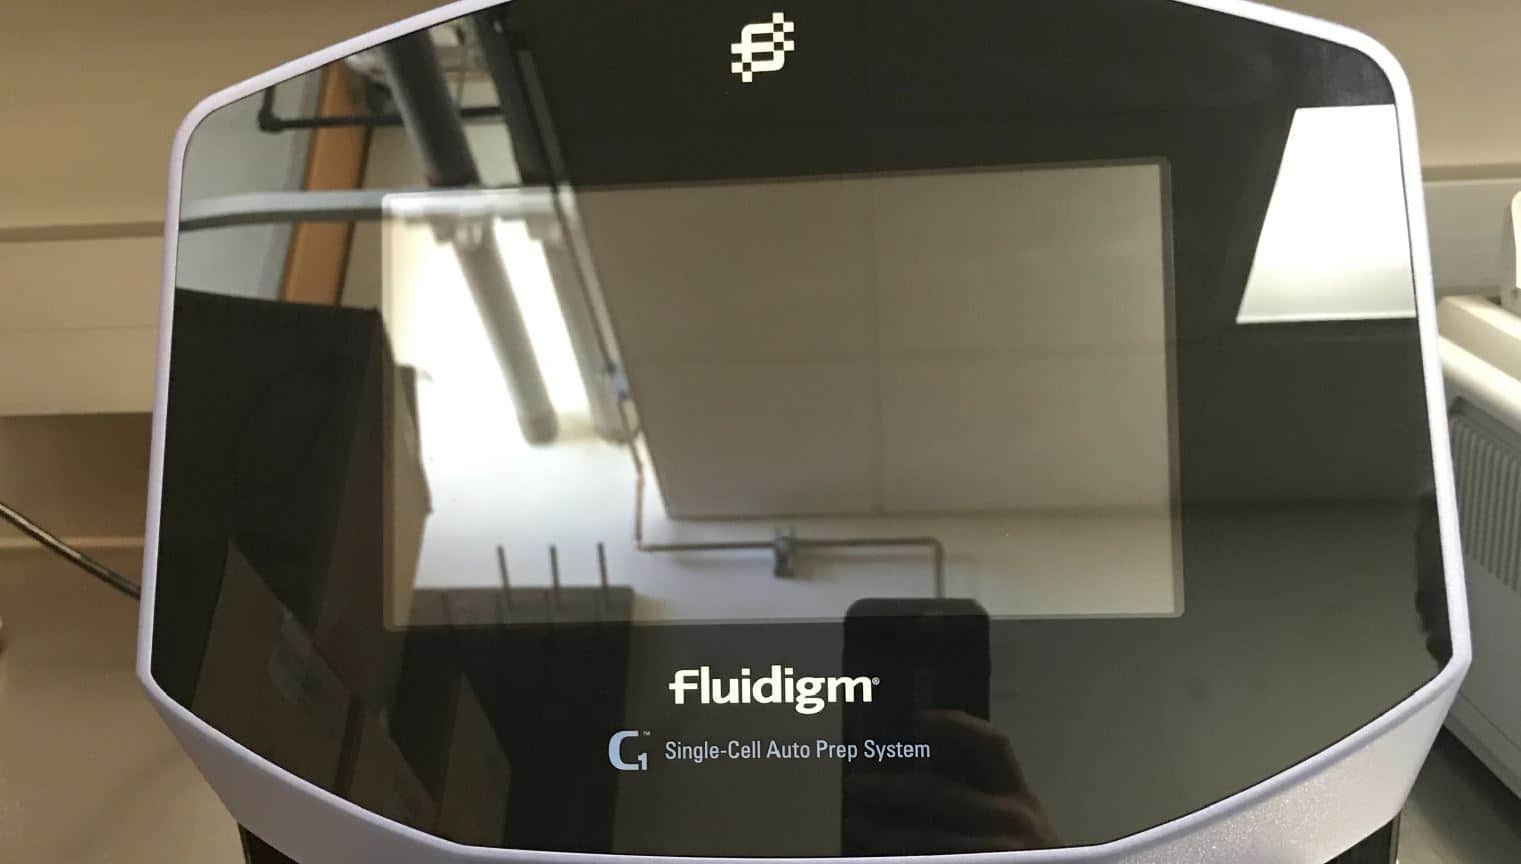 Fluidigm C1 Single Cell Auto Prep System